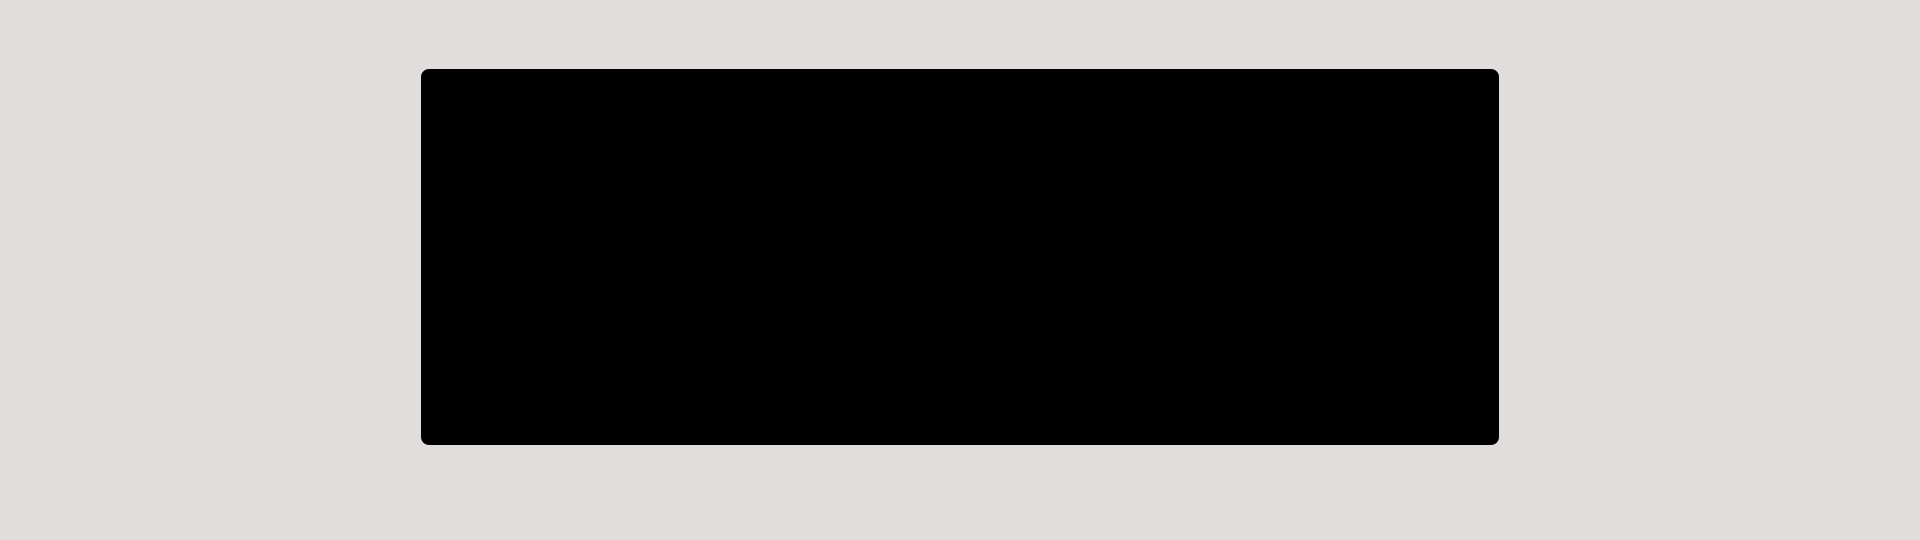 CATEGORY-MDA-GENISHACIMLIBEYAZESYALAR-01-10